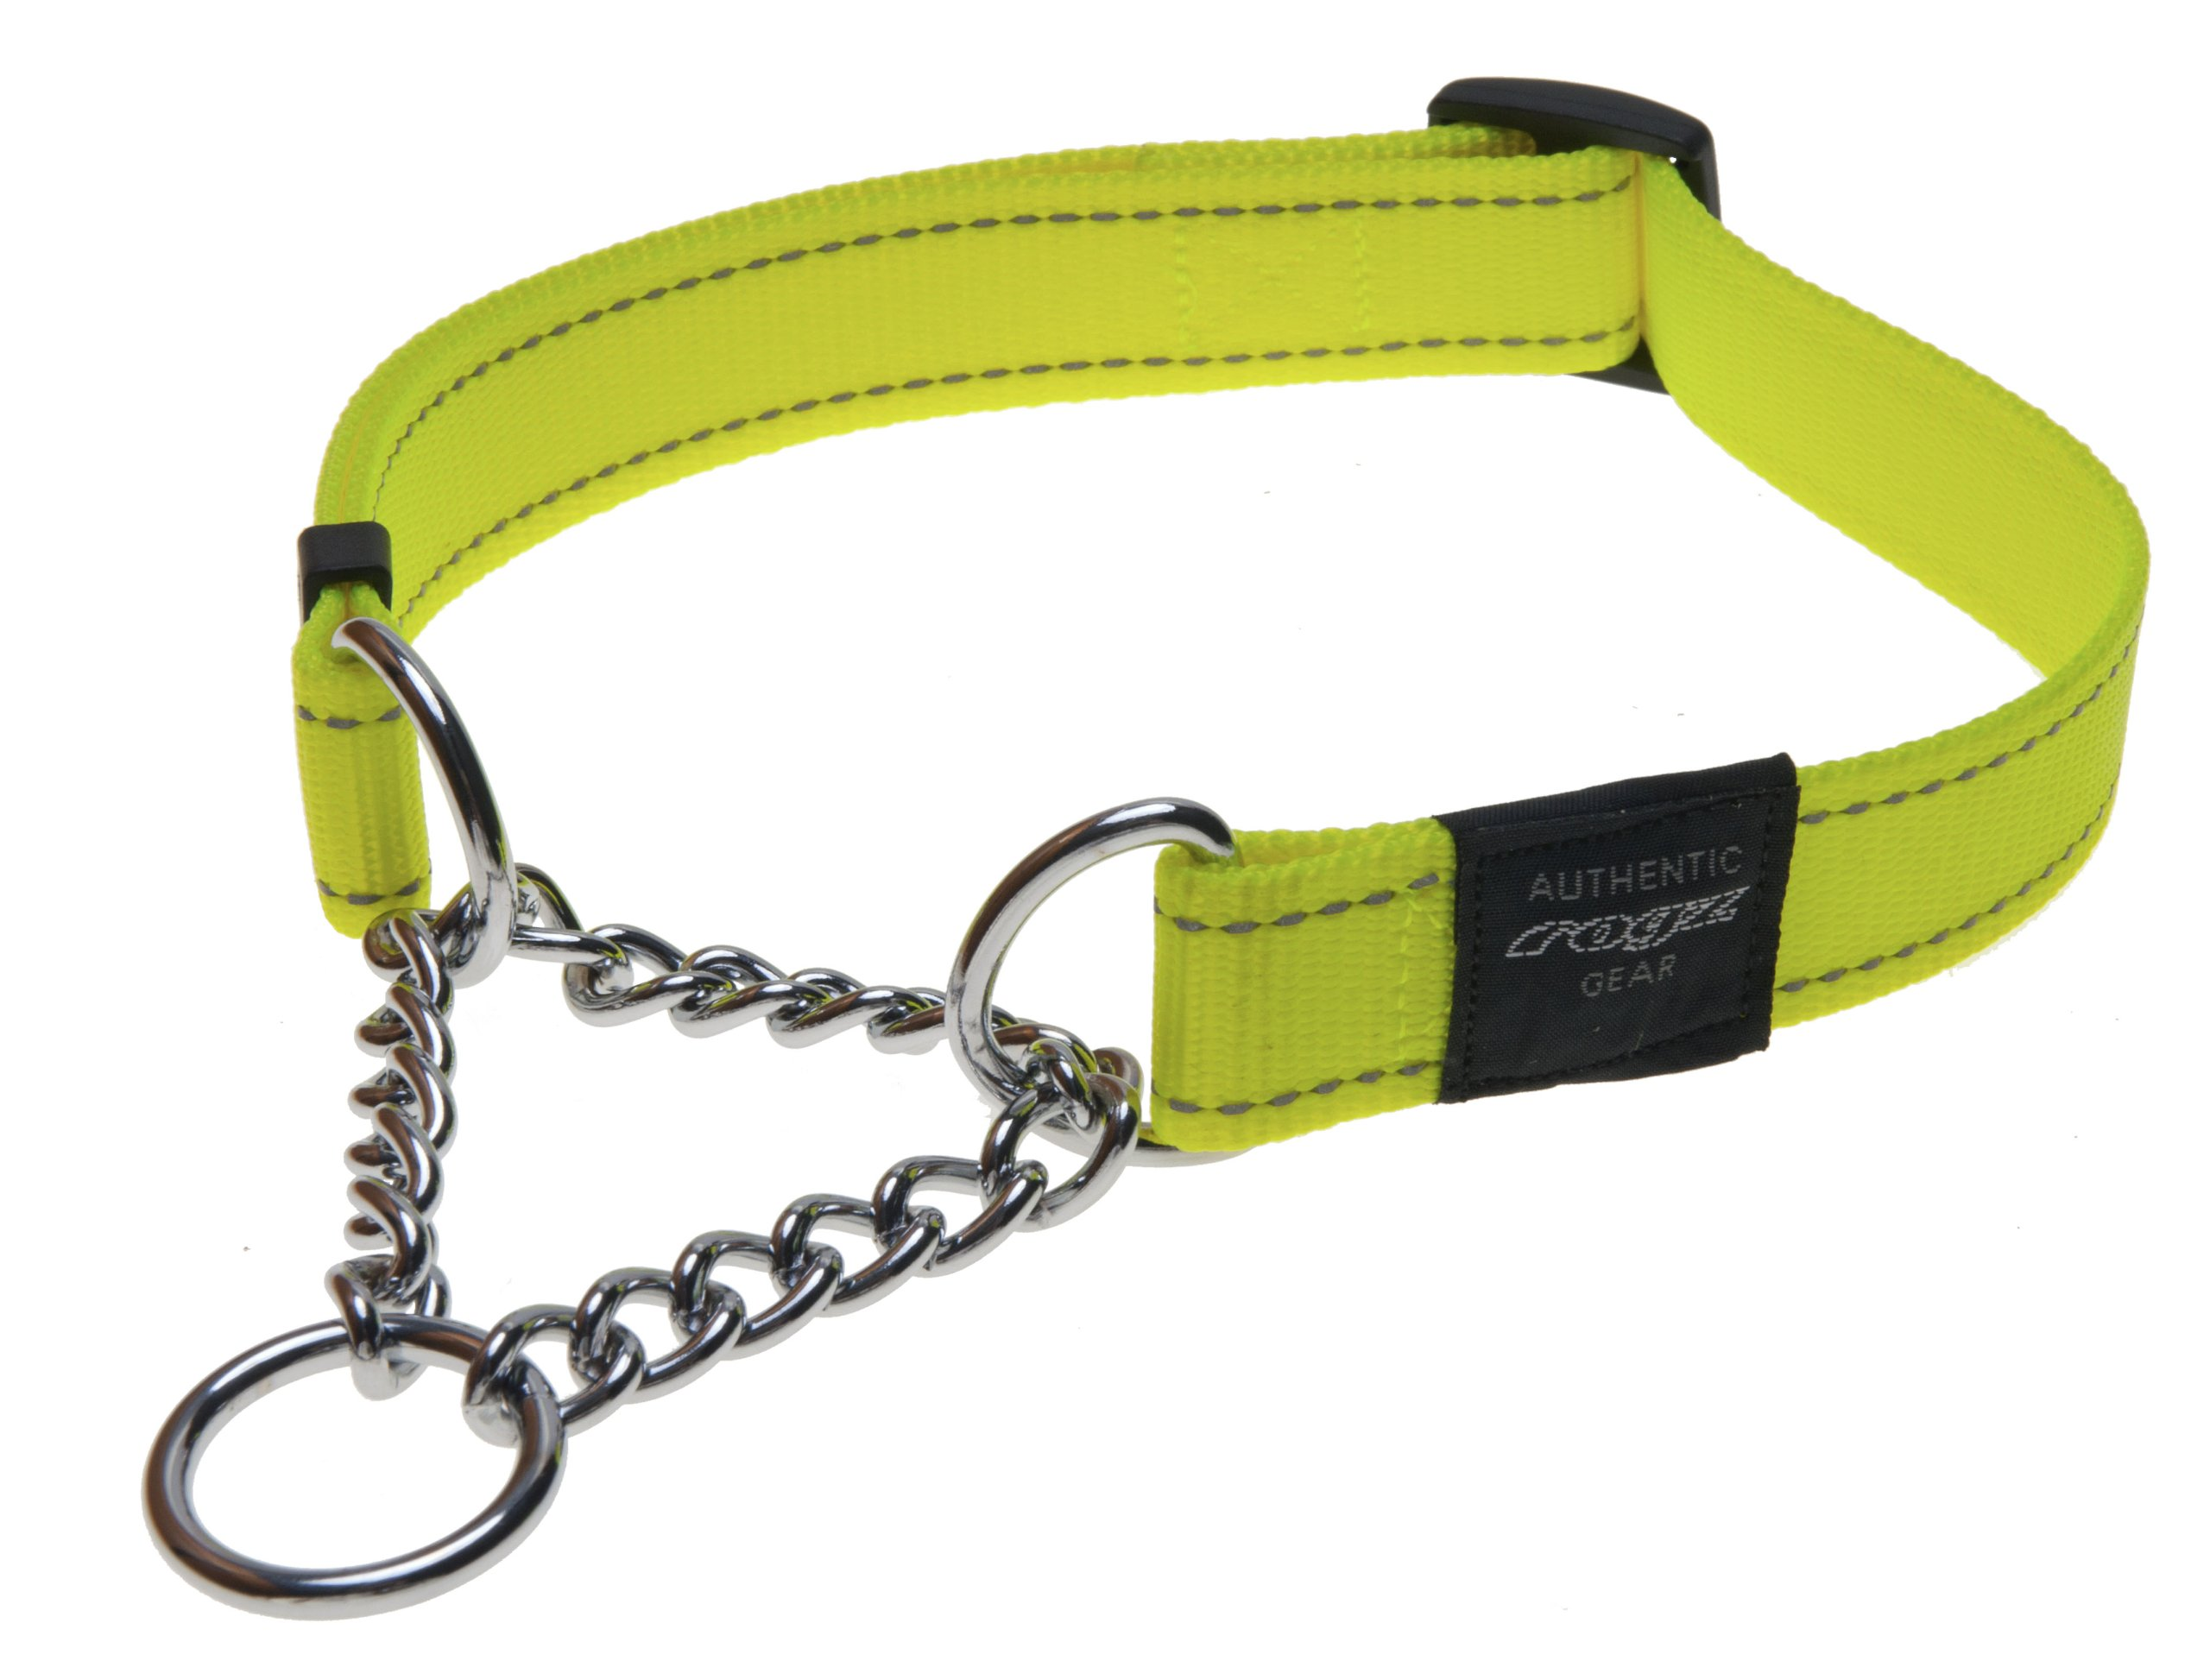 Reflective Nylon Choke Collar; Slip Show Obedience Training Gentle Choker for Large Dogs, Yellow